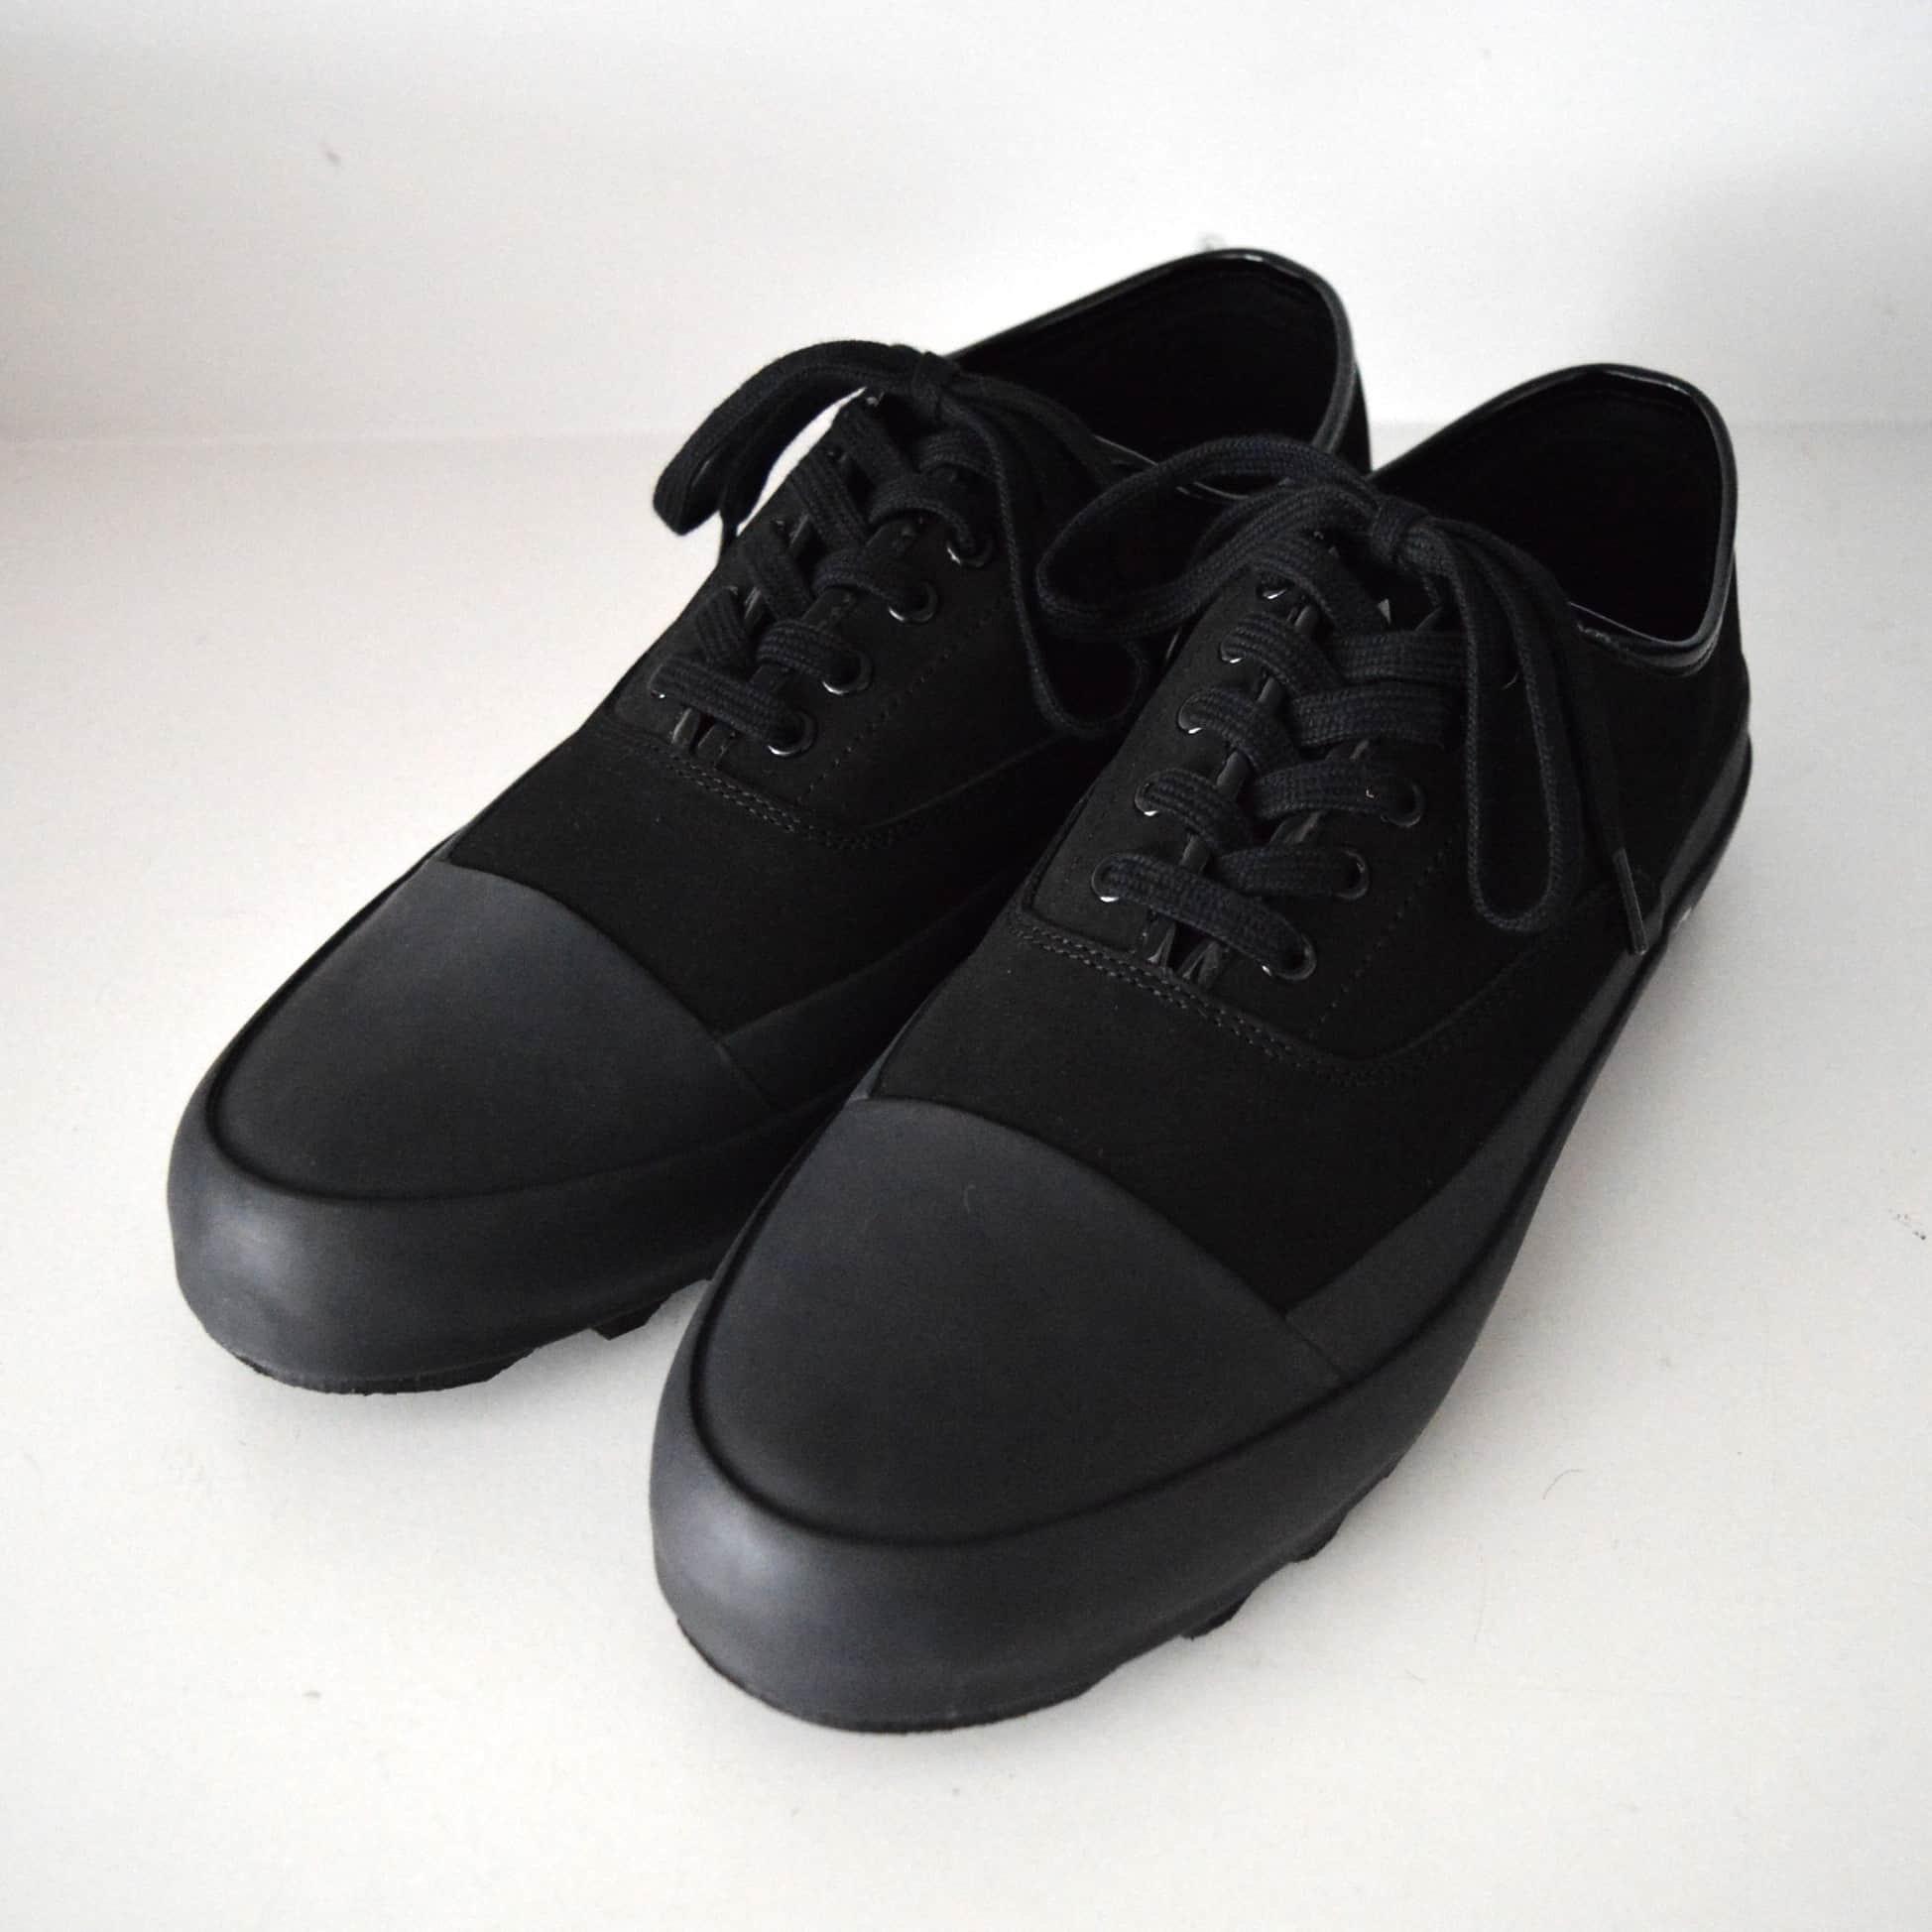 【KIDS LOVE GAITE】Leather Sneaker (Low)